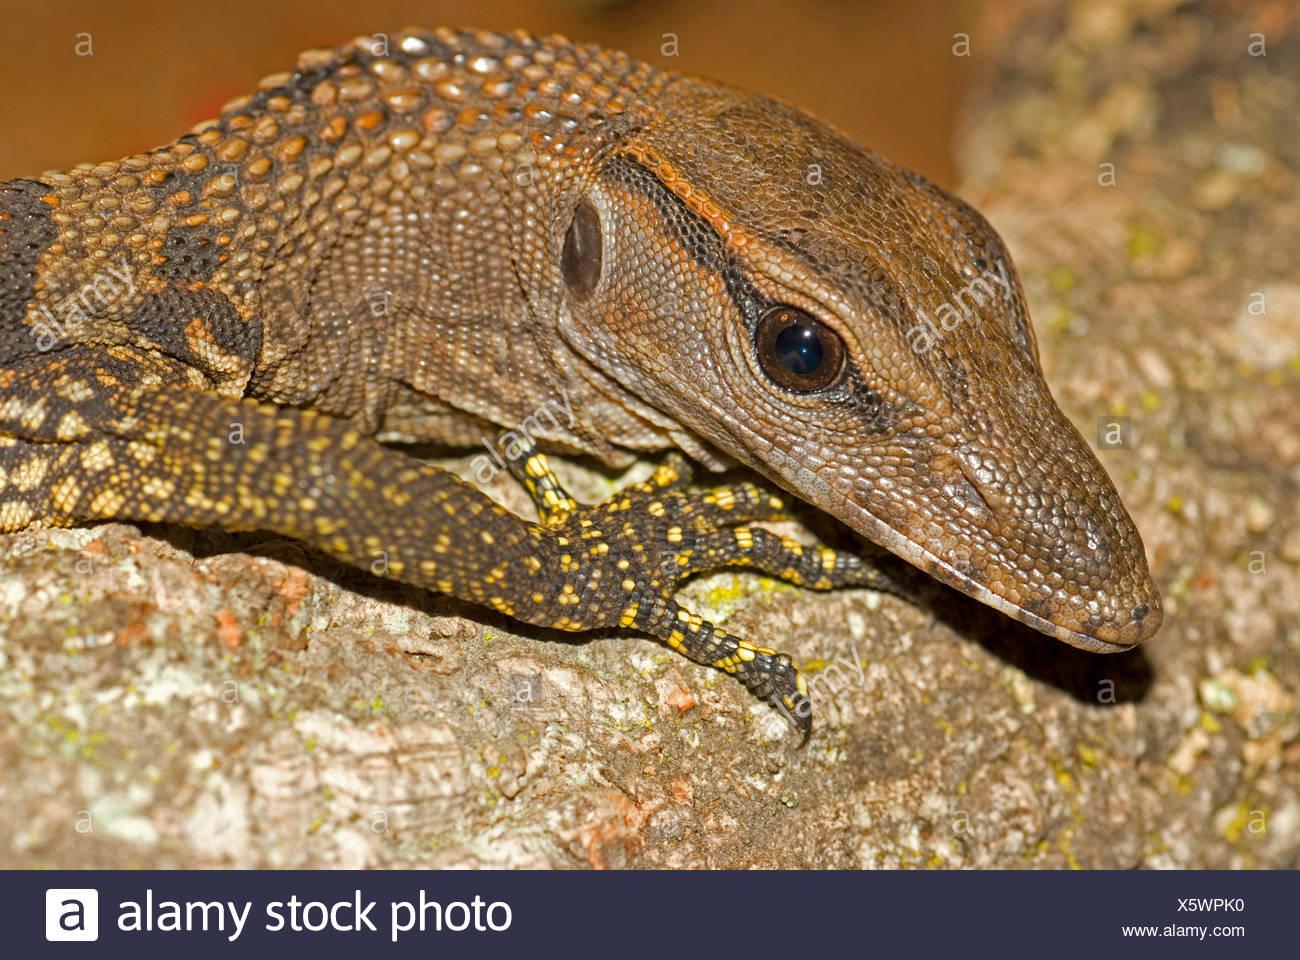 Moniteur à cou rugueux, Tree lizard, Arlequin moniteur (Varanus rudicollis), portrait Photo Stock